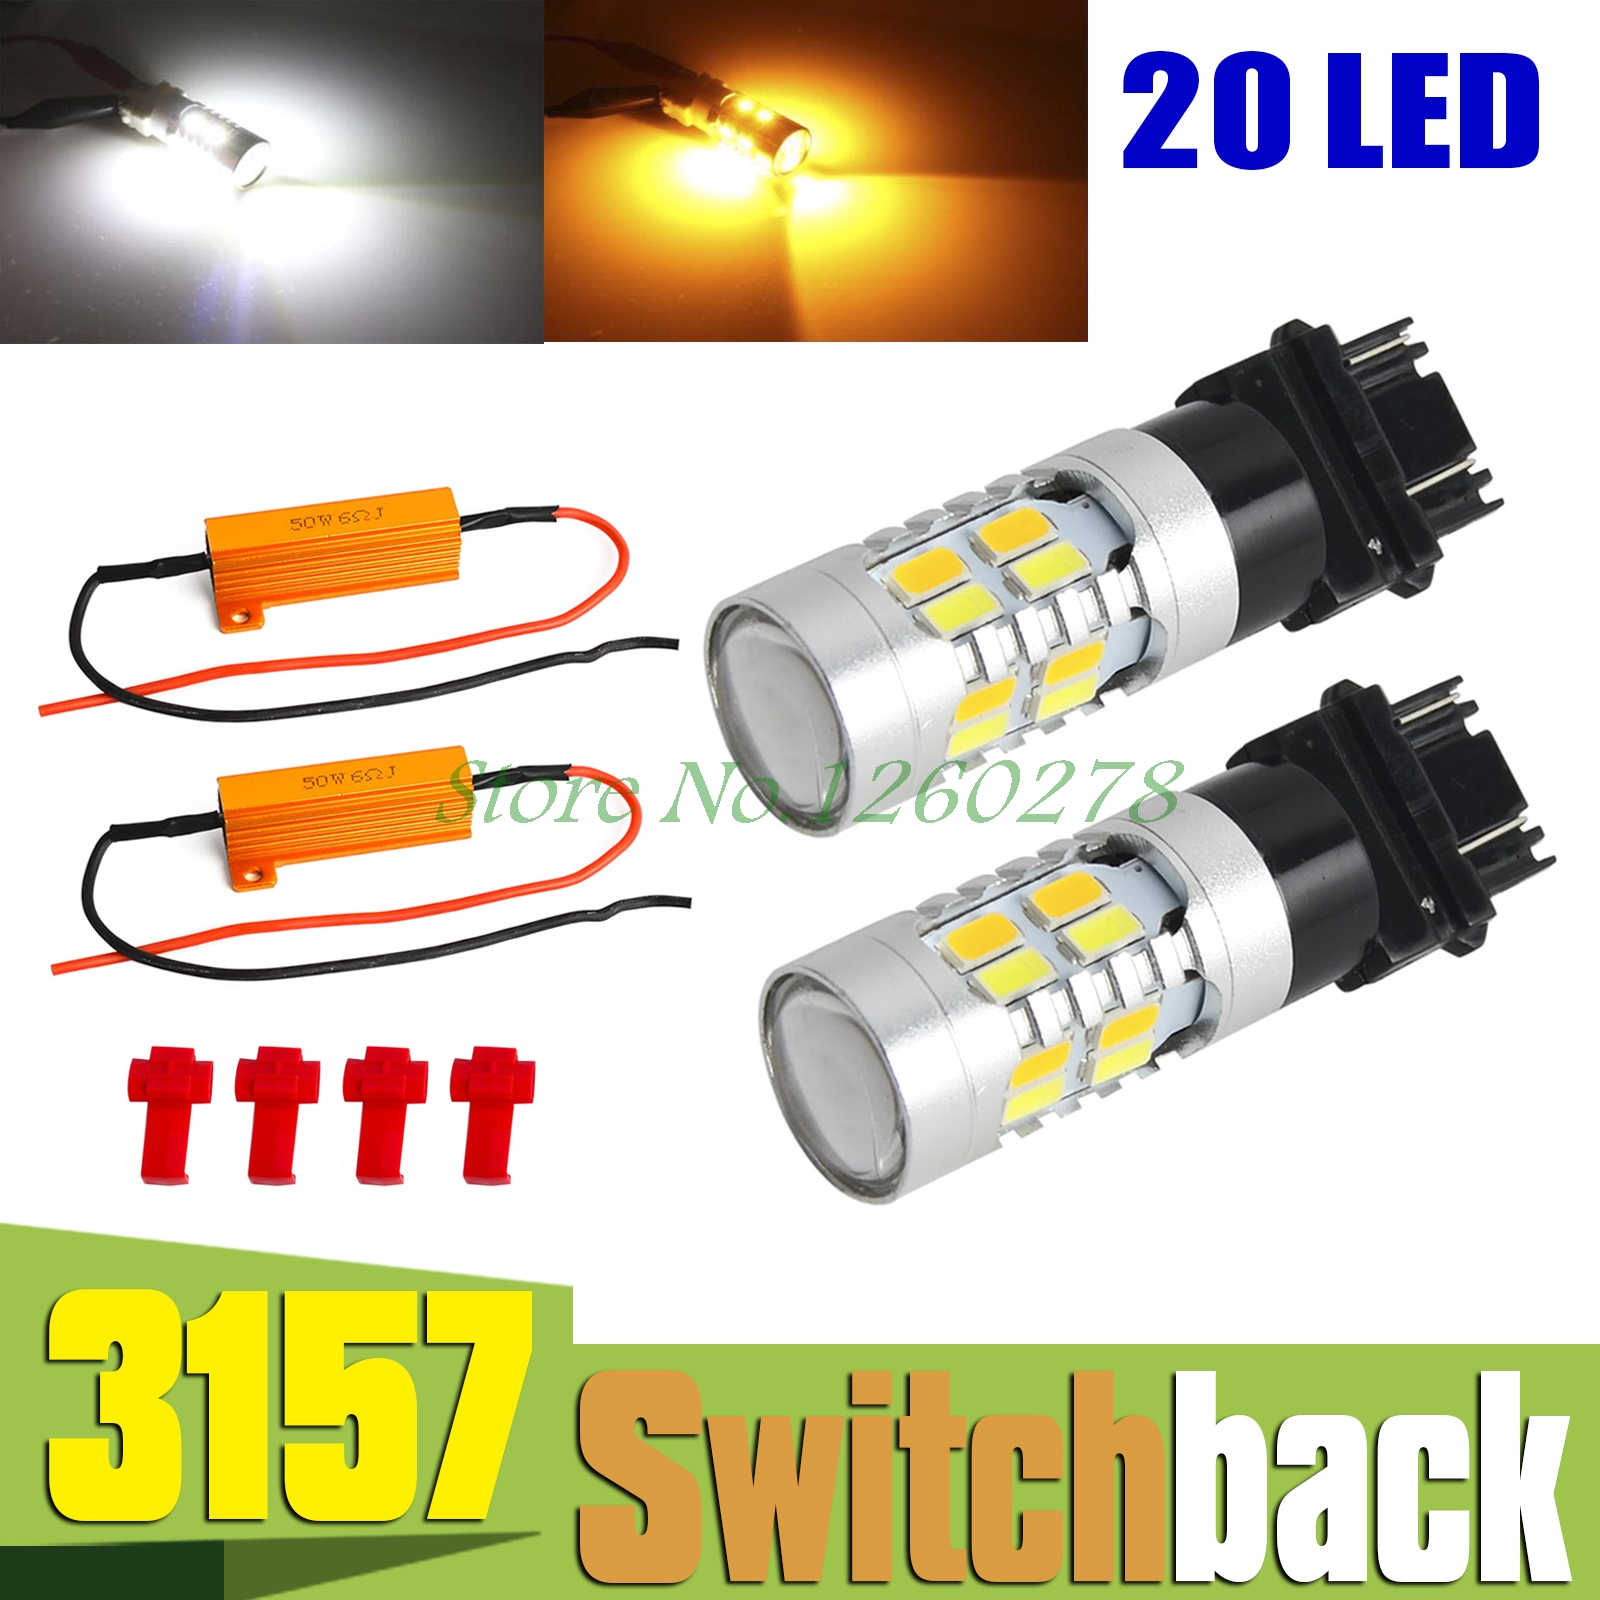 3157 White Amber Dual Color Switchback LED Turn Signal Light Bulbs+Resistors плащ wonderland плащ